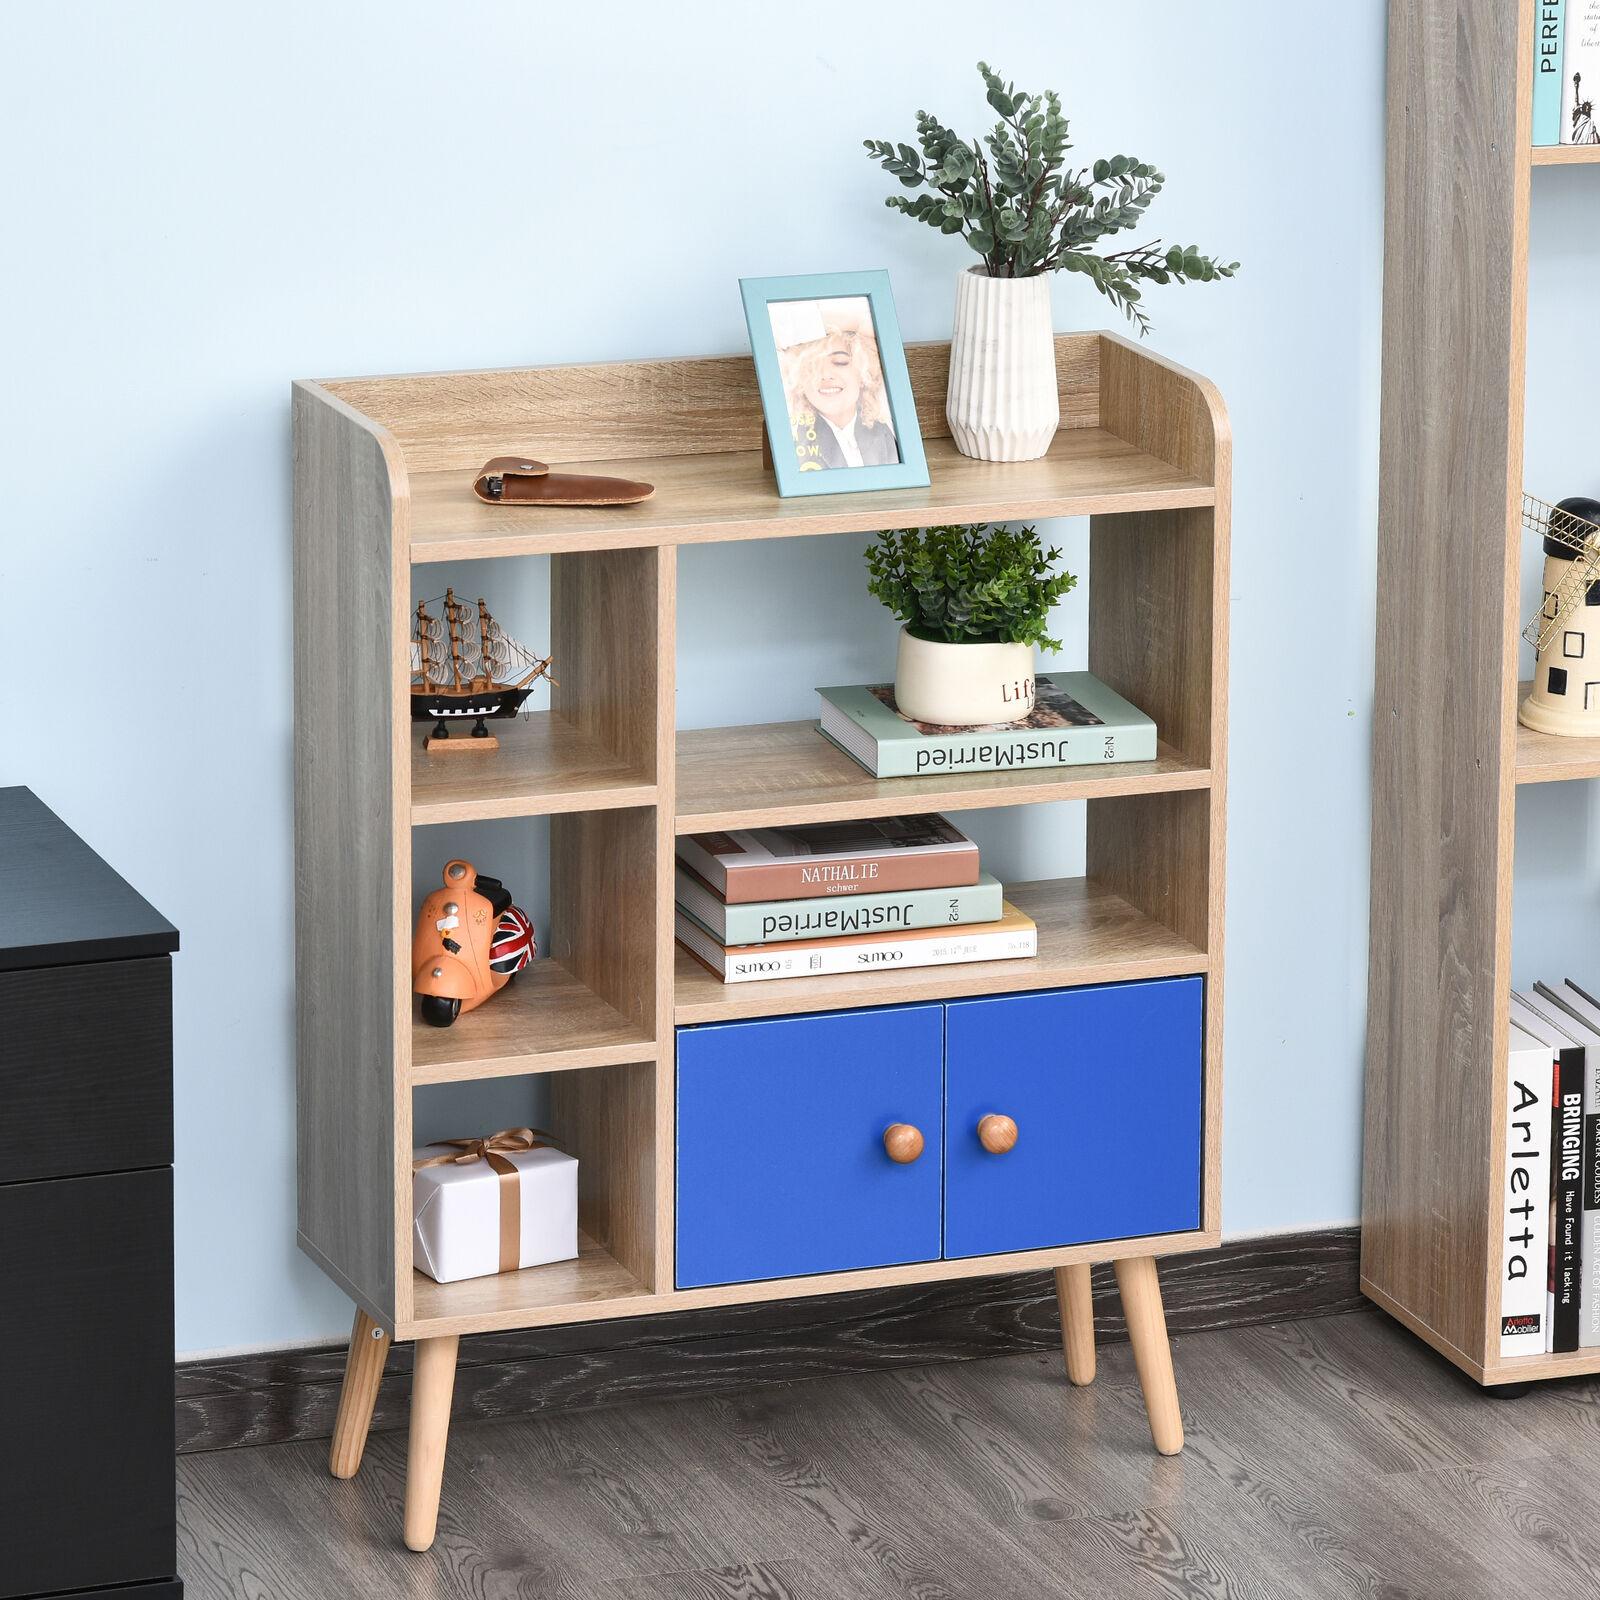 Multi-Shelf Bookcase Freestanding Storage Cabinet With Wood Legs - £21.59 / Drawer Version £20.79 Using code @ eBay / mhstarukltd